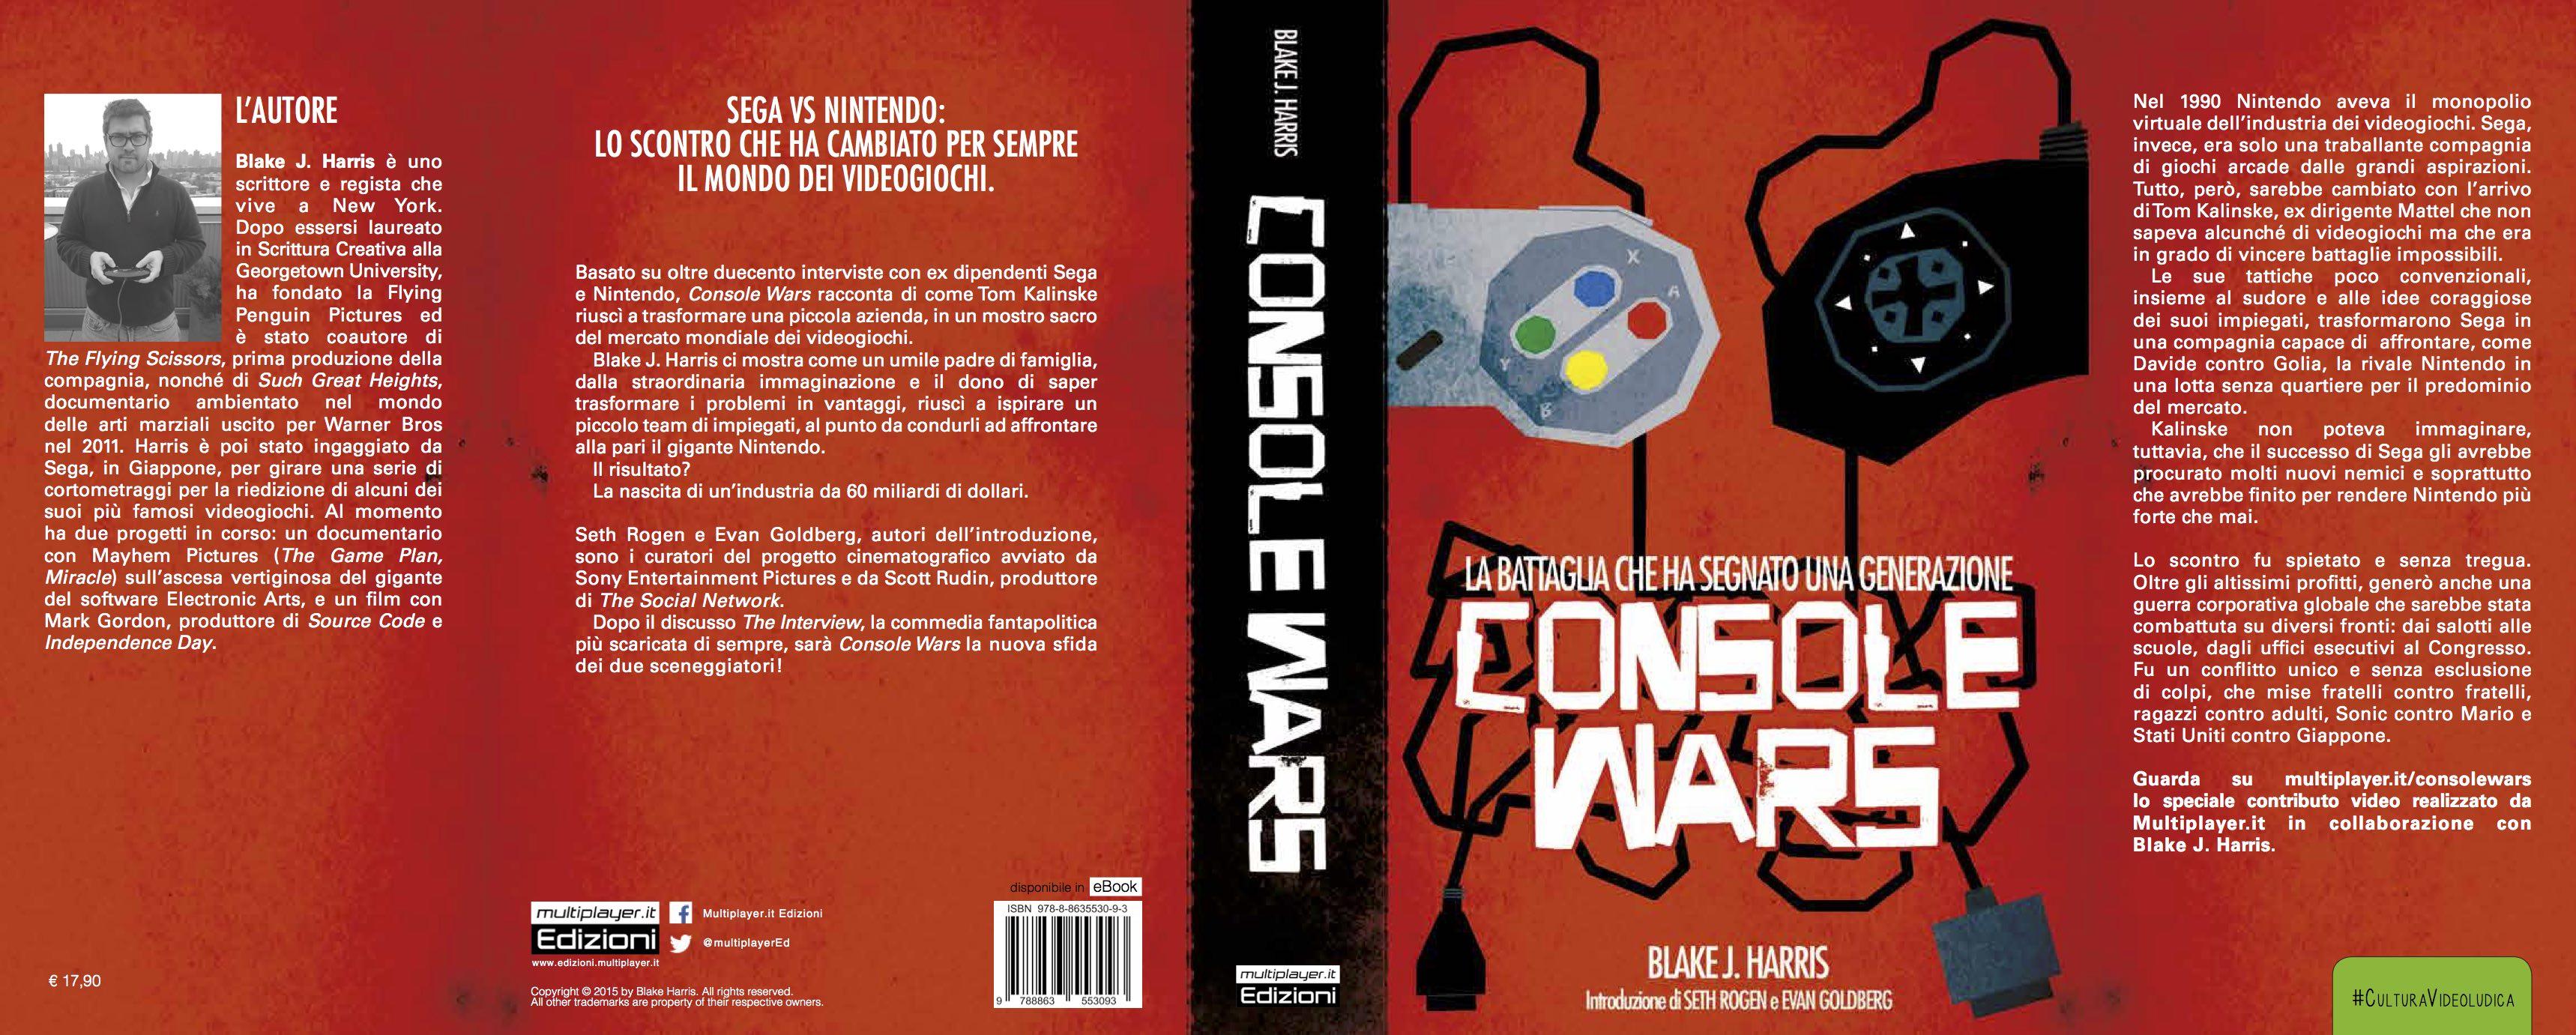 ConsoleWars-Copertina-LOGOold-low